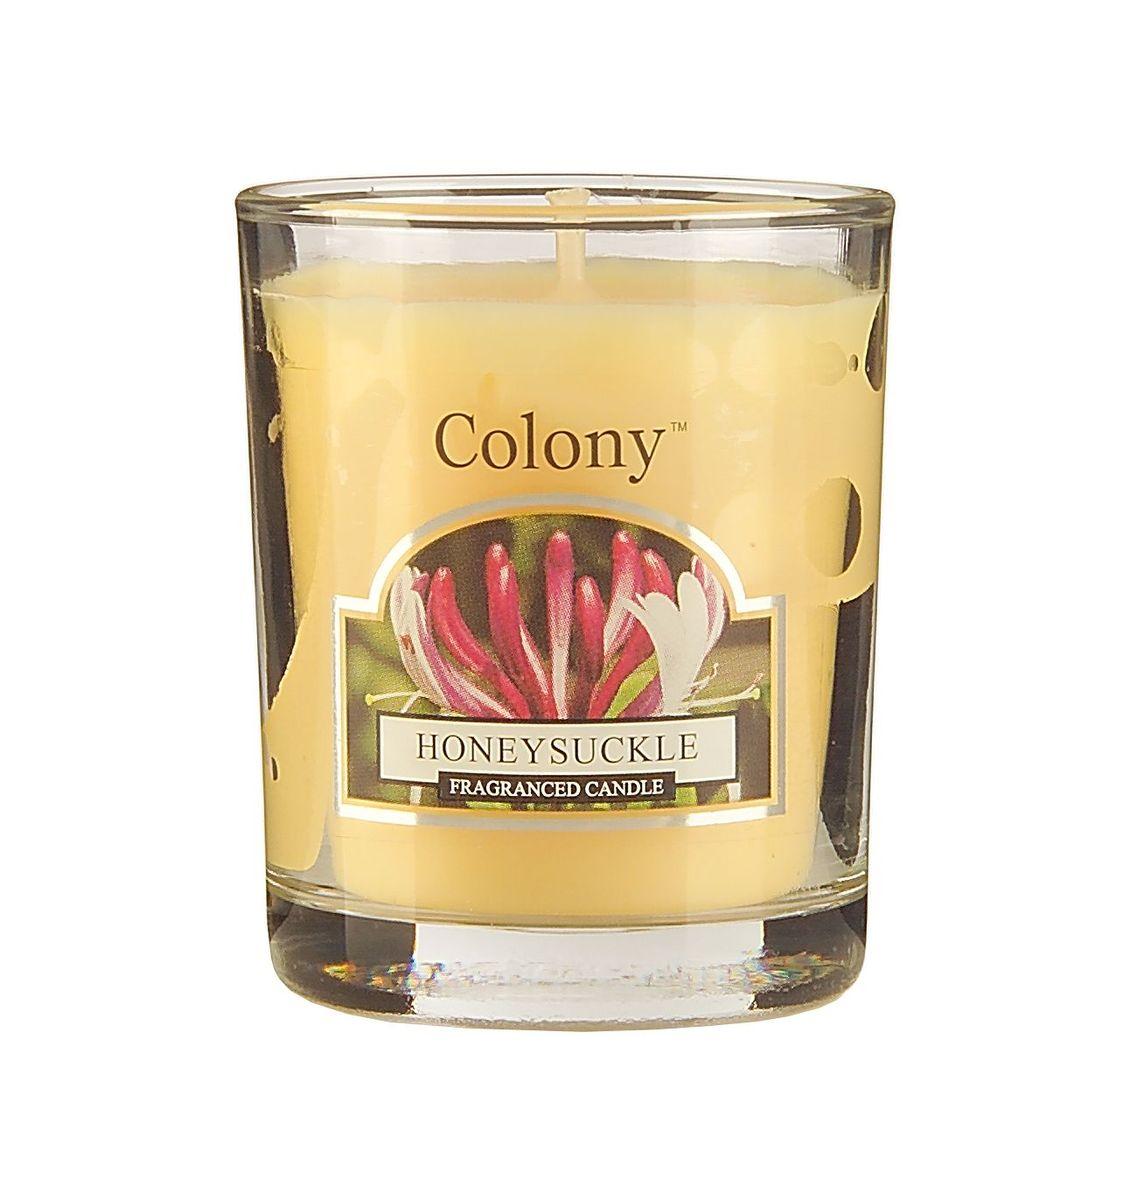 Свеча ароматическая лампадная Wax Lyrical Цветущая жимолость, 14 часов, 130 г ароматическая лампадная свеча зимний вечер